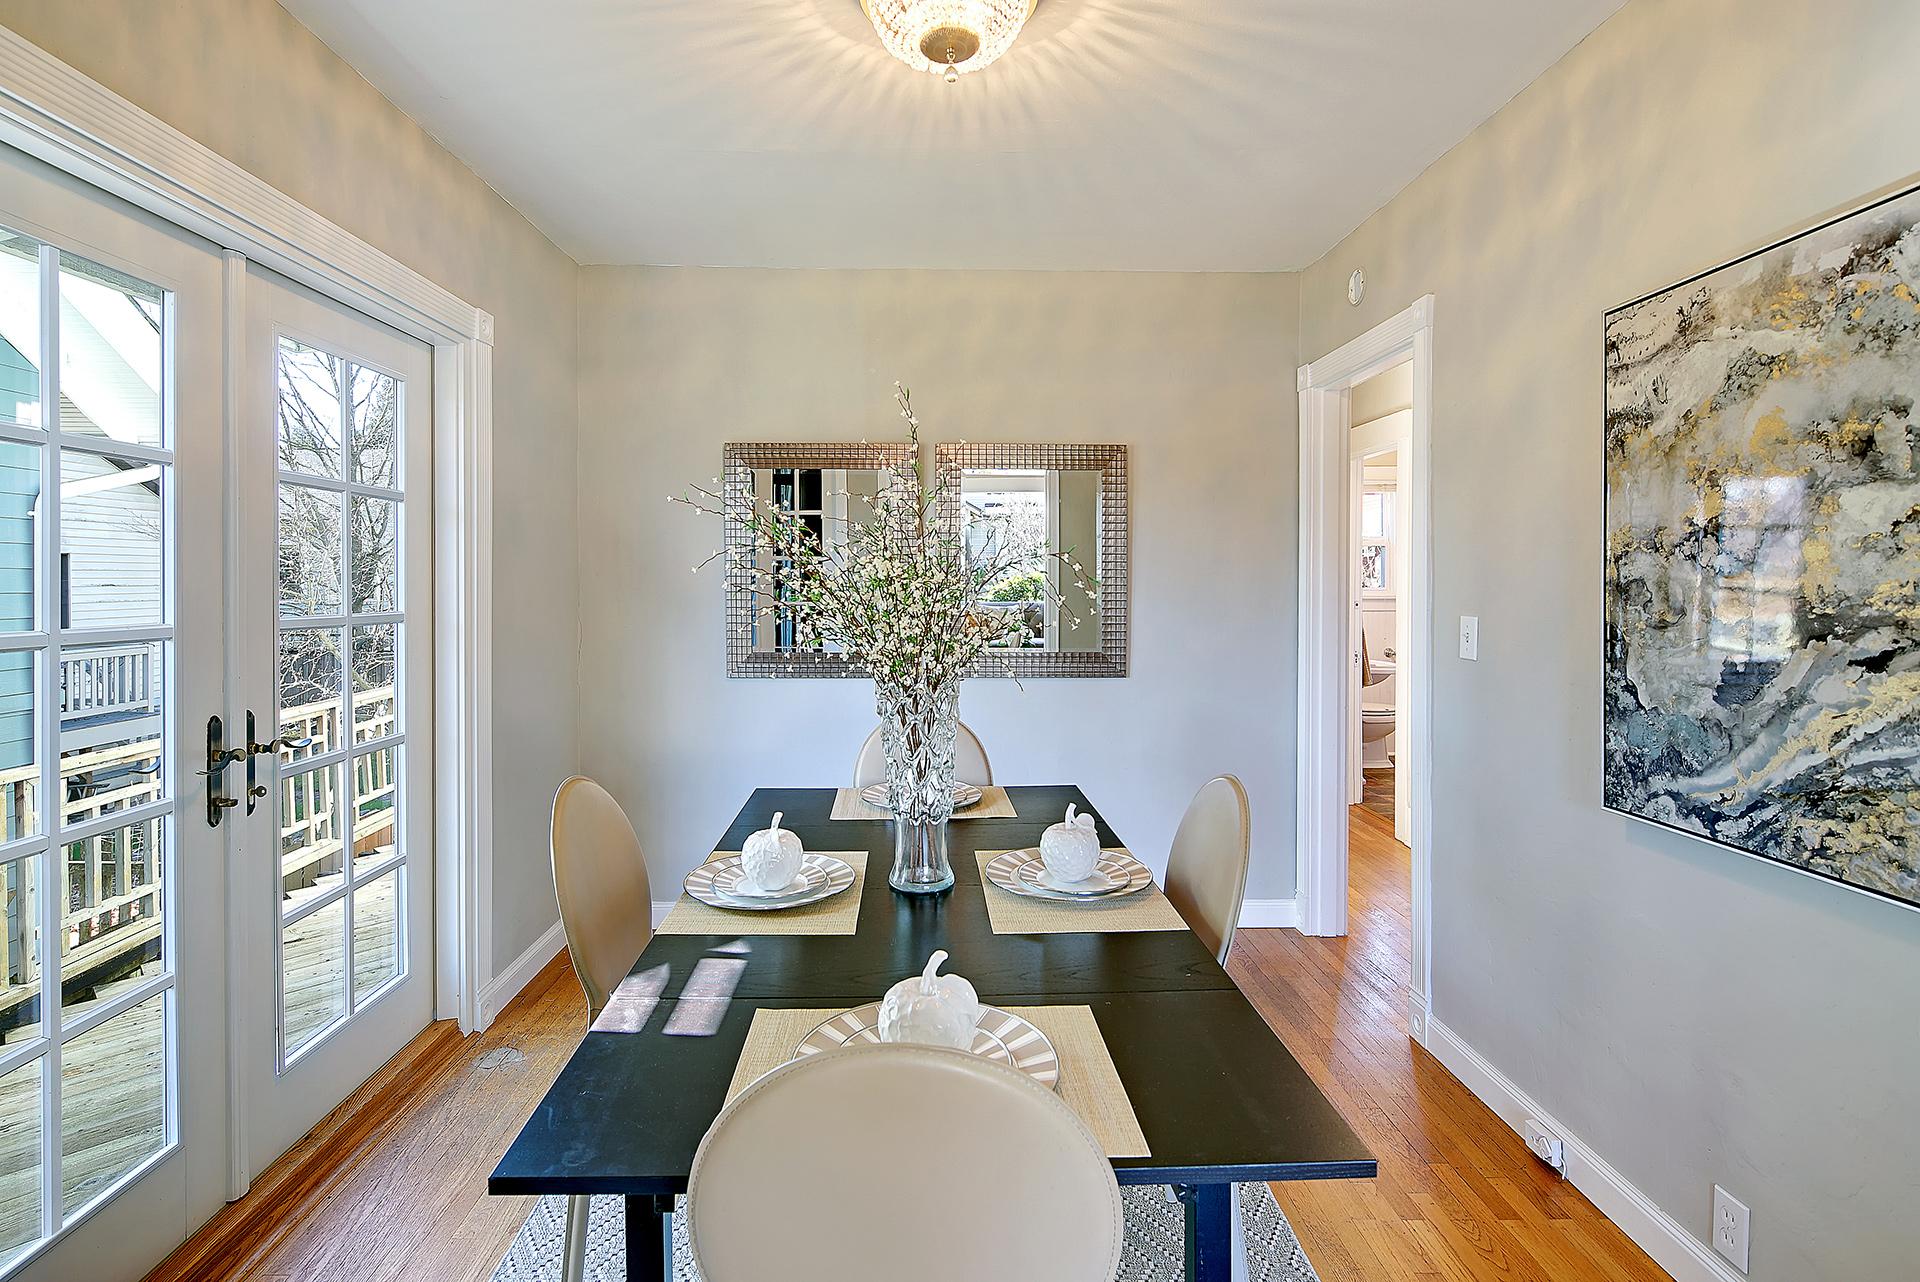 Greenlake-Carissa-Saffel-Real-Estate.jpg